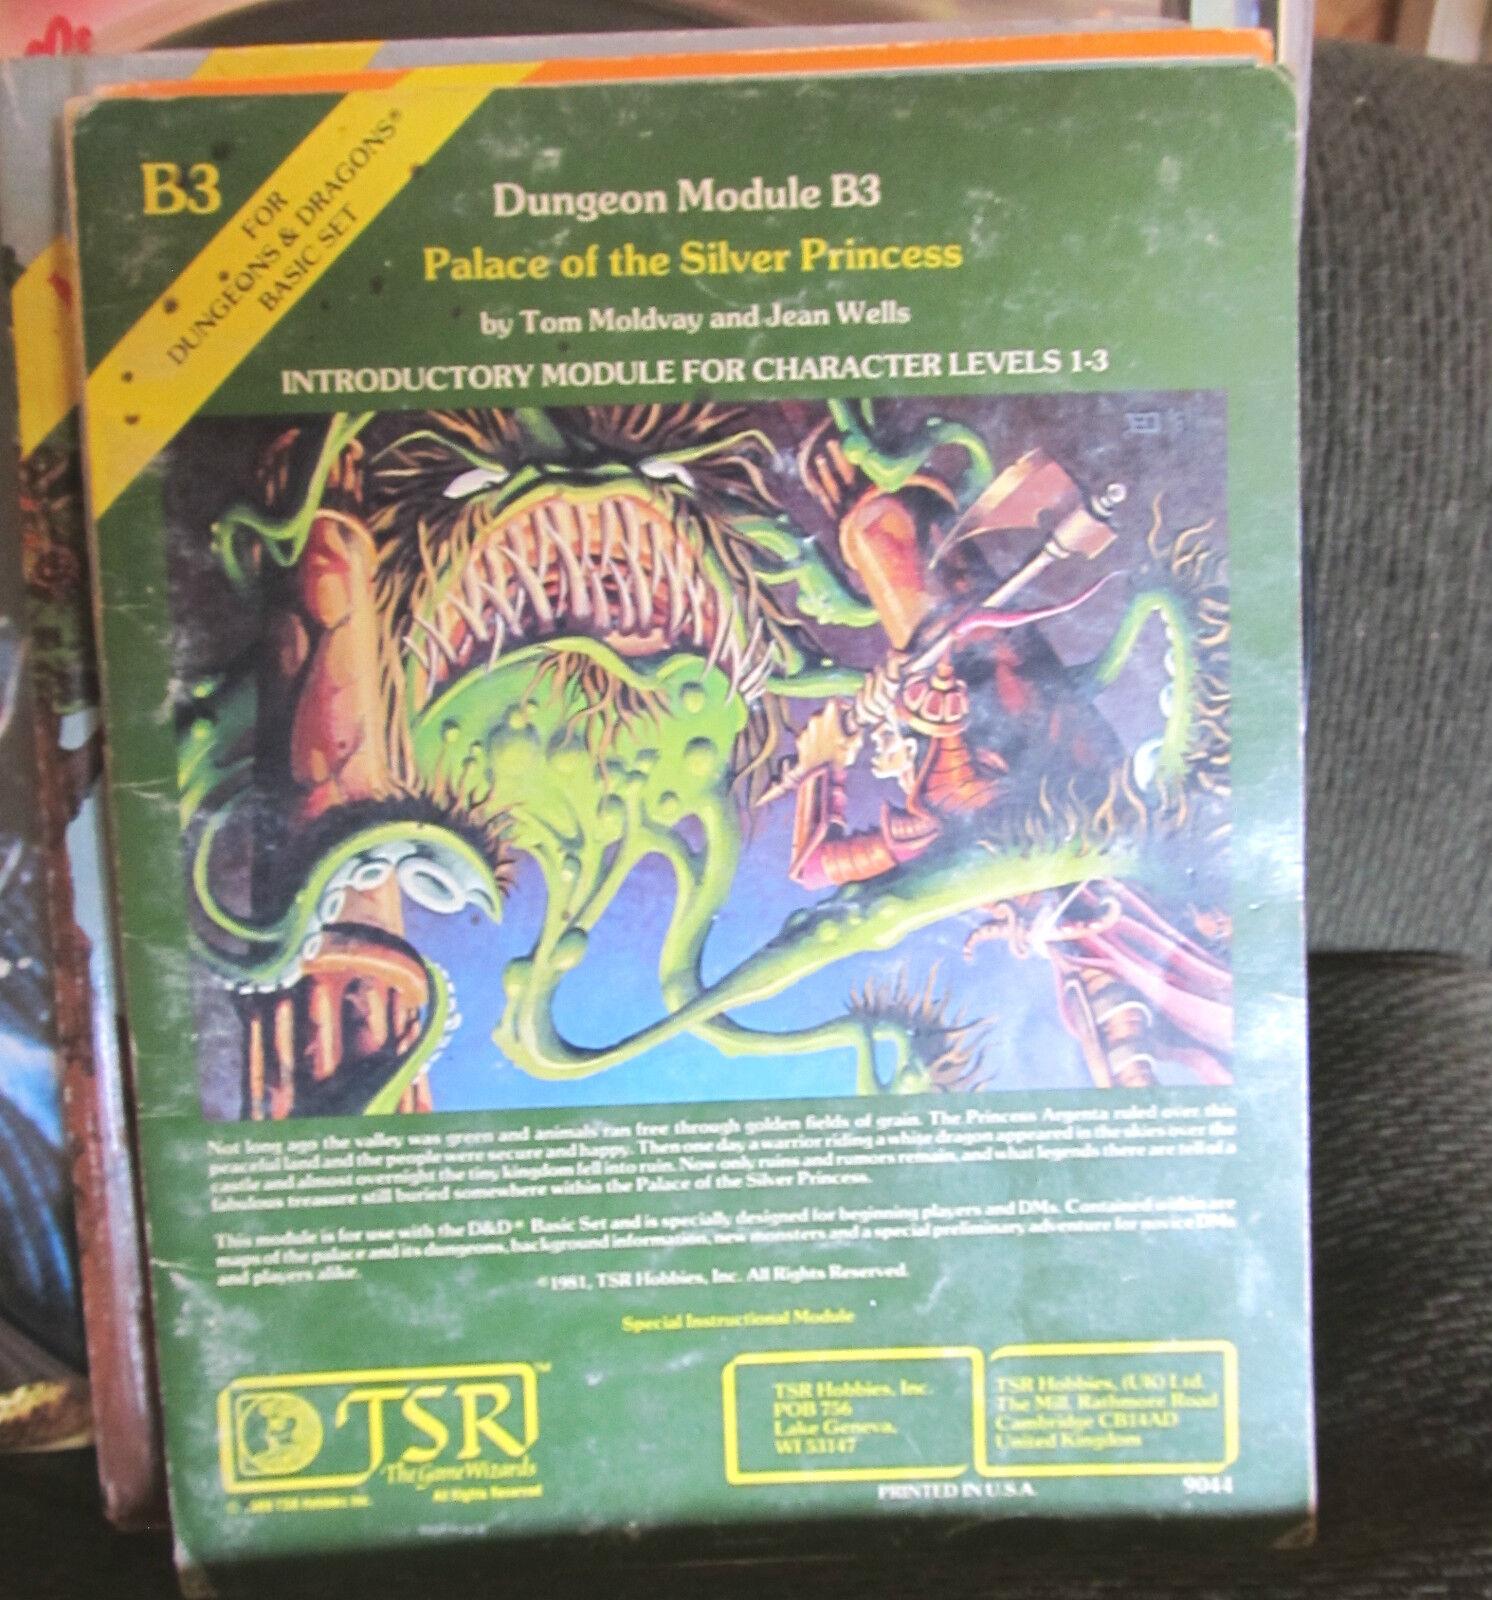 B3 Palast der Silber Prinzessin Dungeons & Dragons Modul TSR 9044 1981 Basic